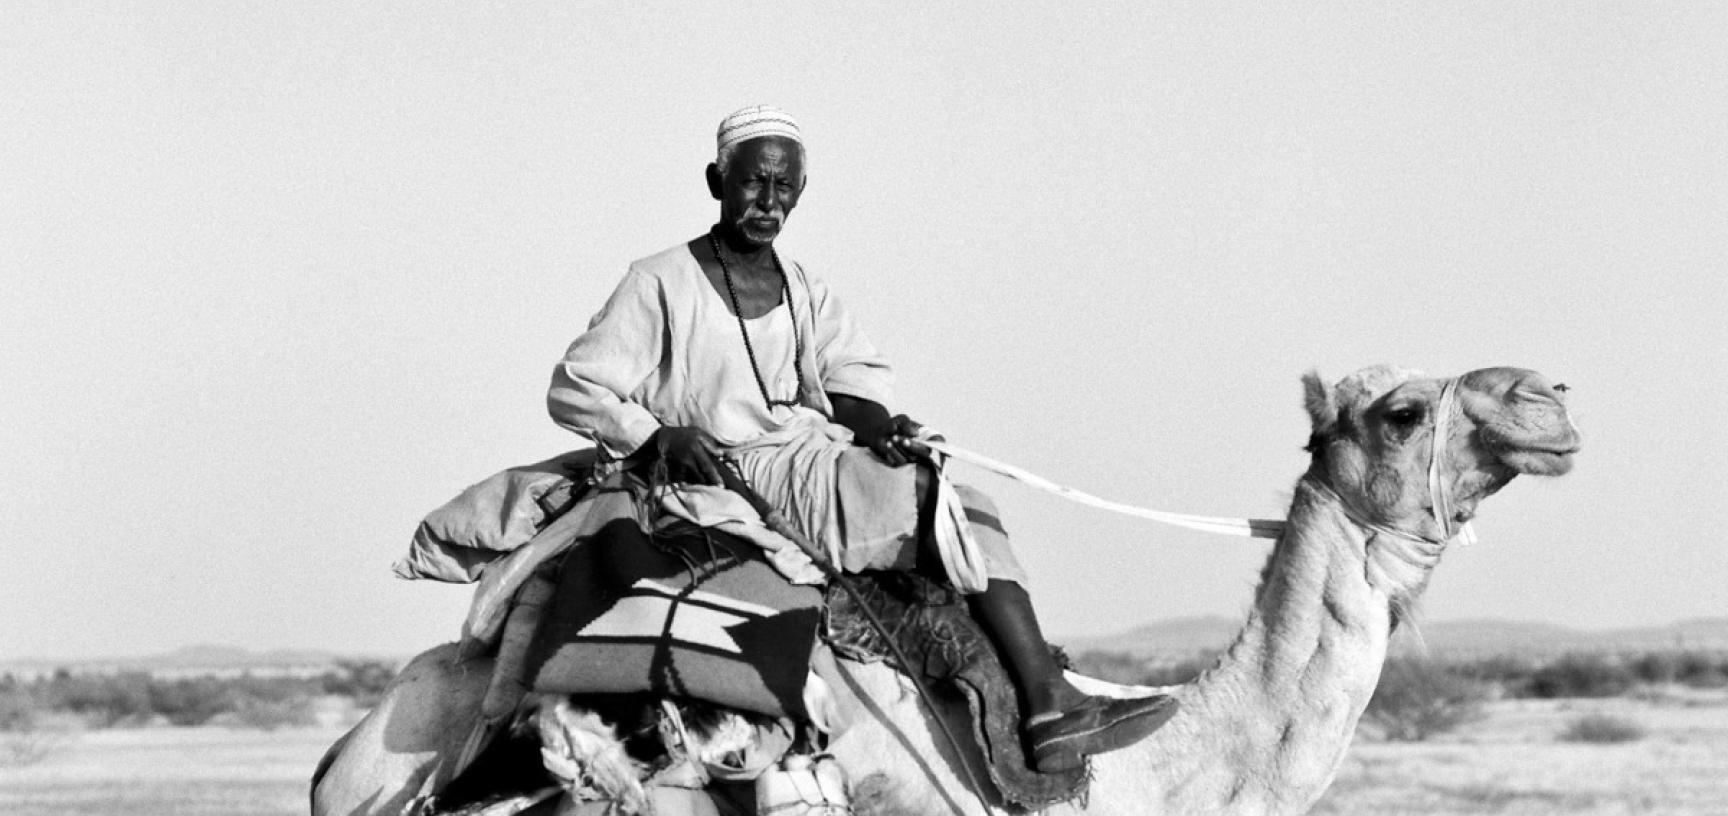 Kababish tribesman. Sudan. Photograph by Roger Chapman. 2014. (Copyright Roger Chapman)